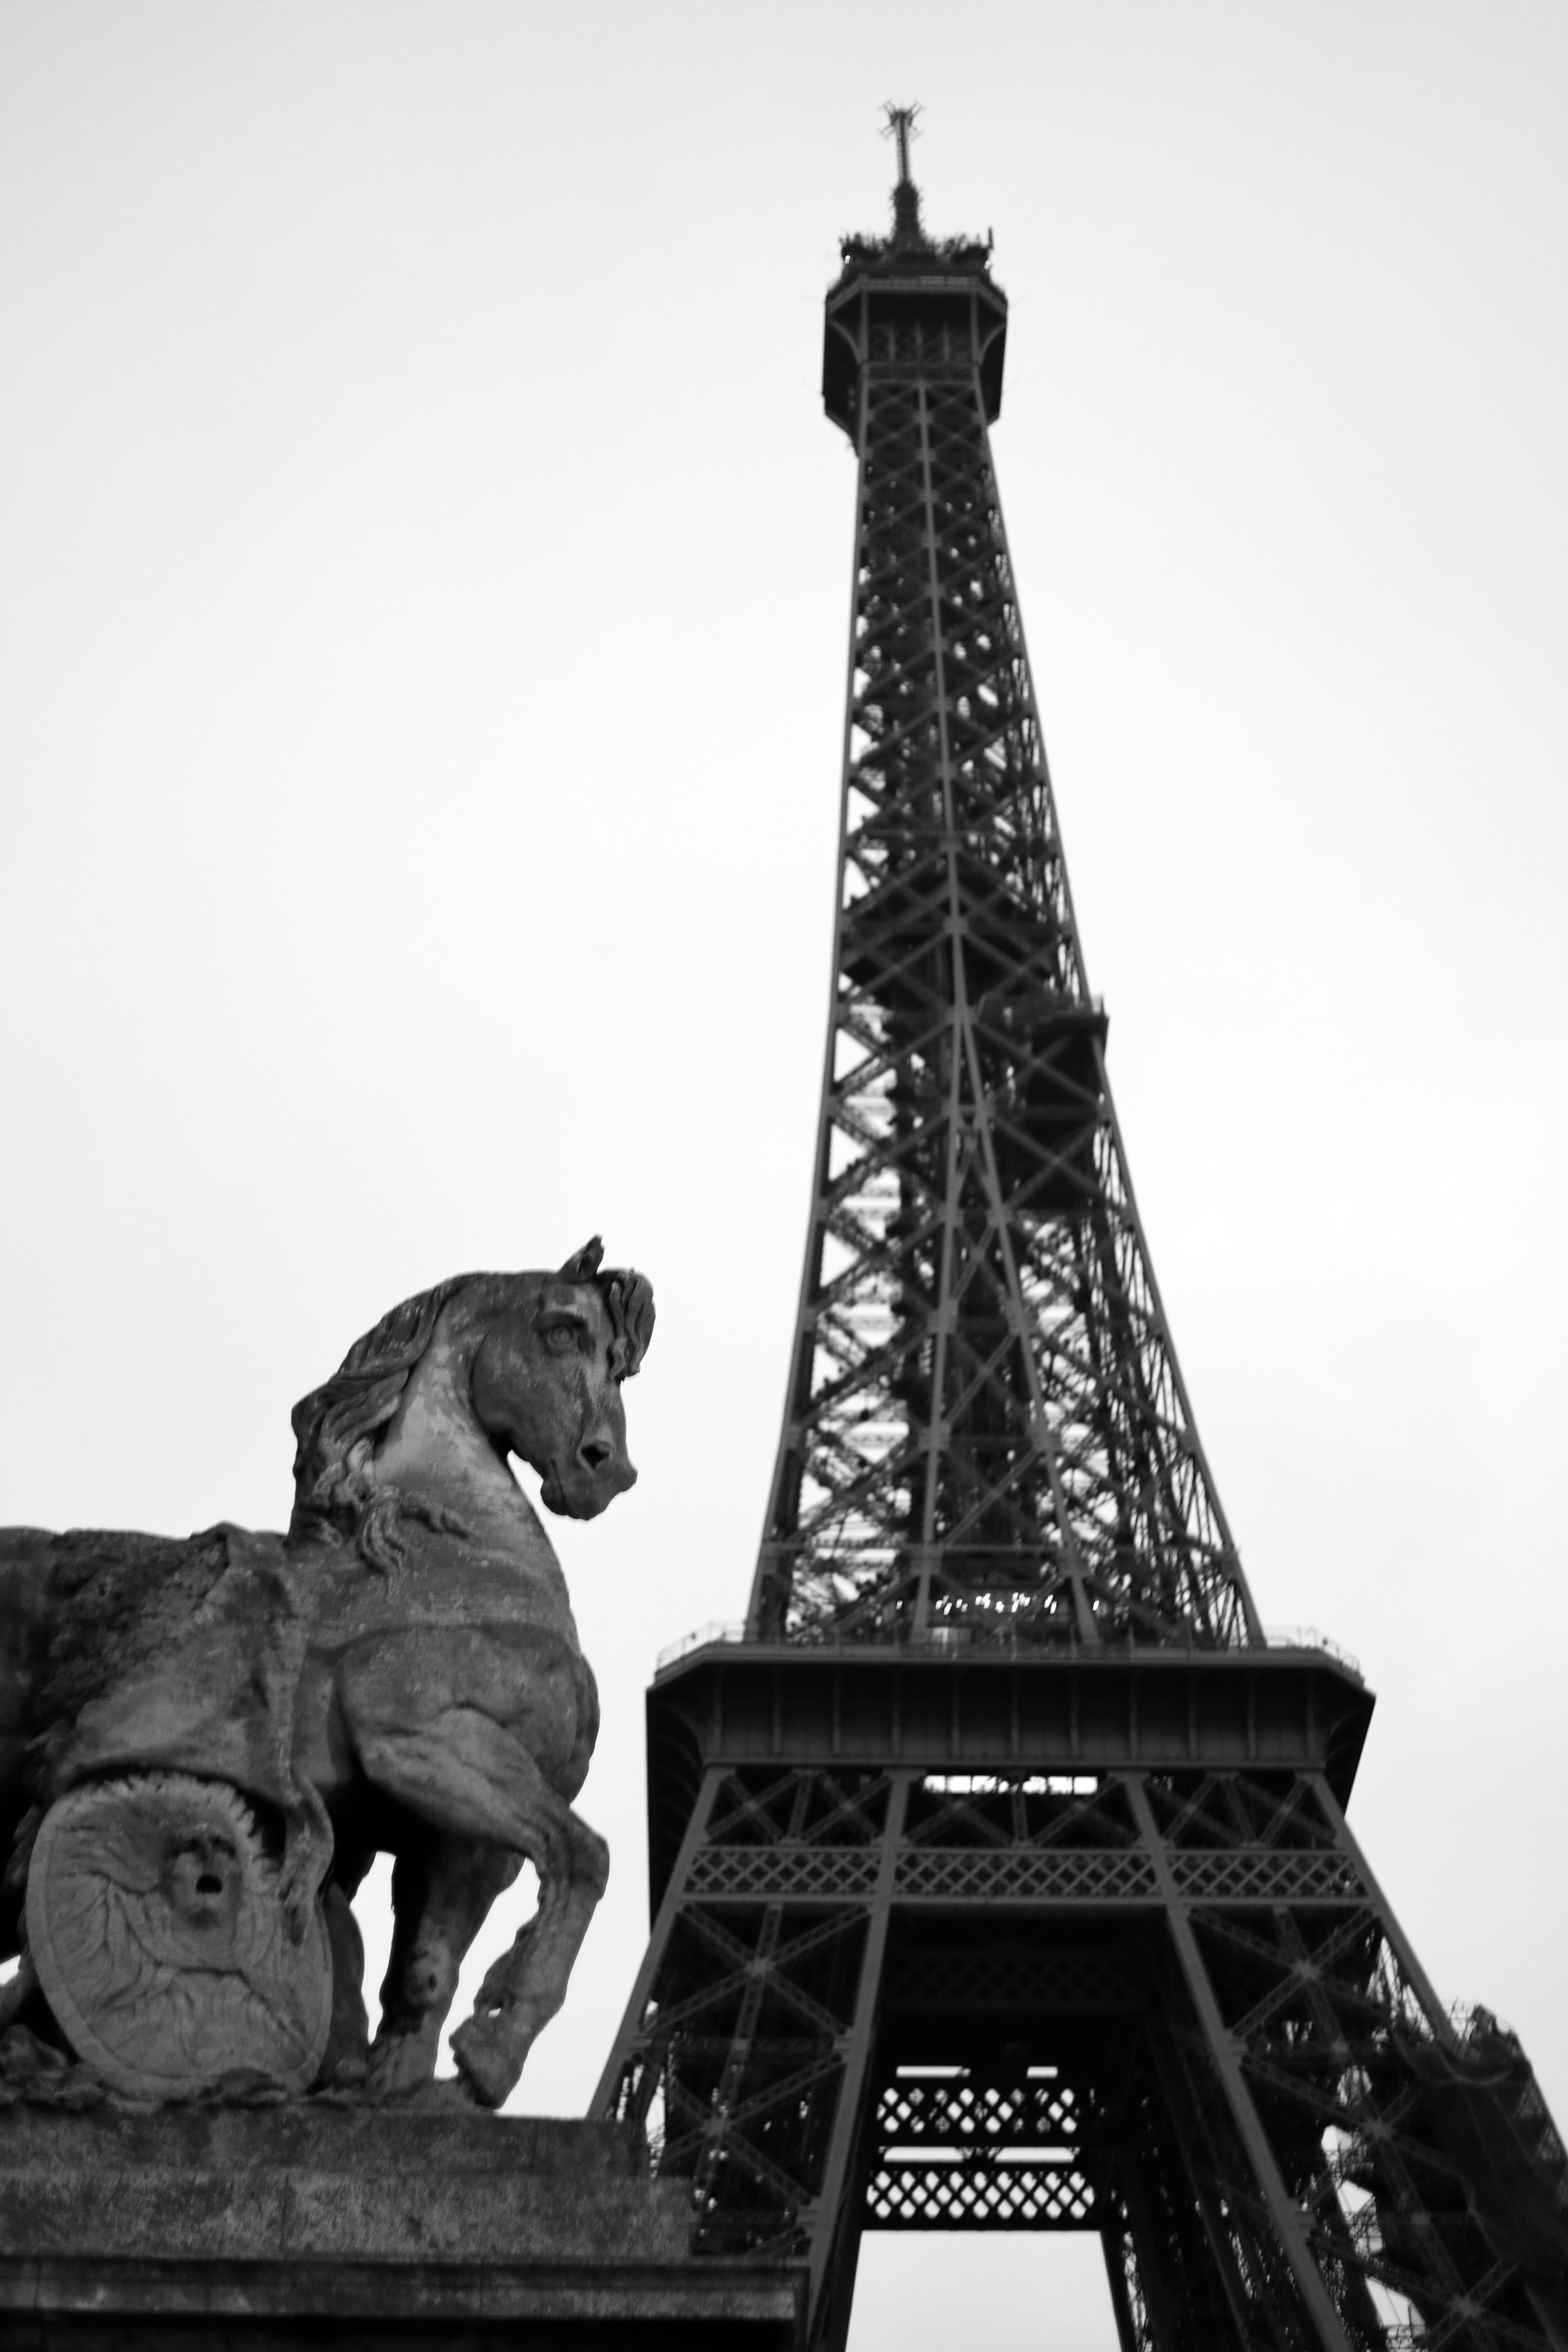 Horse statue under the Eiffel Tower, Paris, France   https://www.ebay.com/itm/263679763929?ssPageName=STRK:MESELX:IT&_trksid=p3984.m1555.l2649